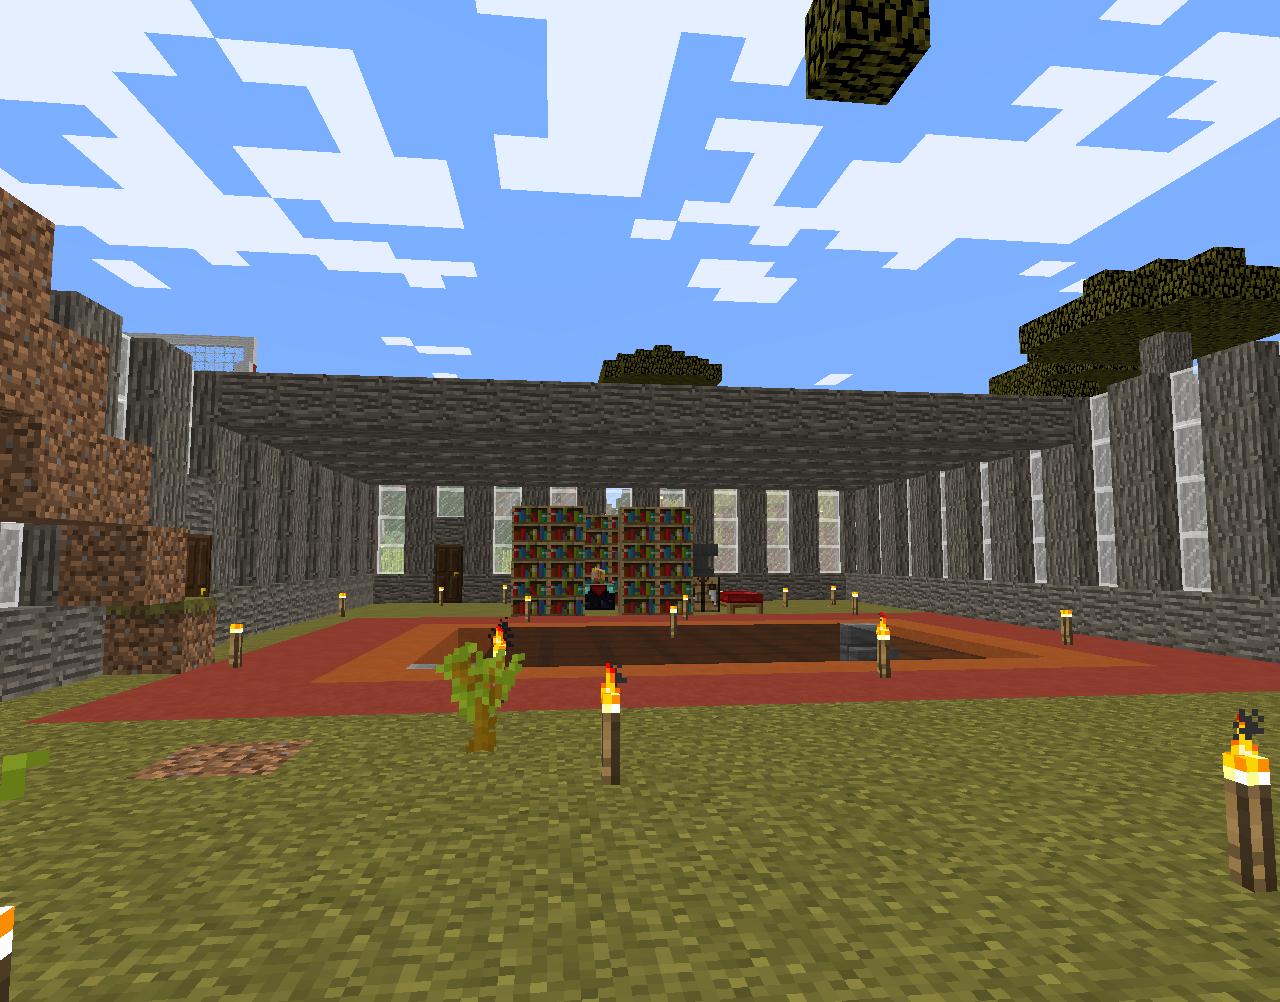 Building an acacia wood house #minecraft | Minecraft